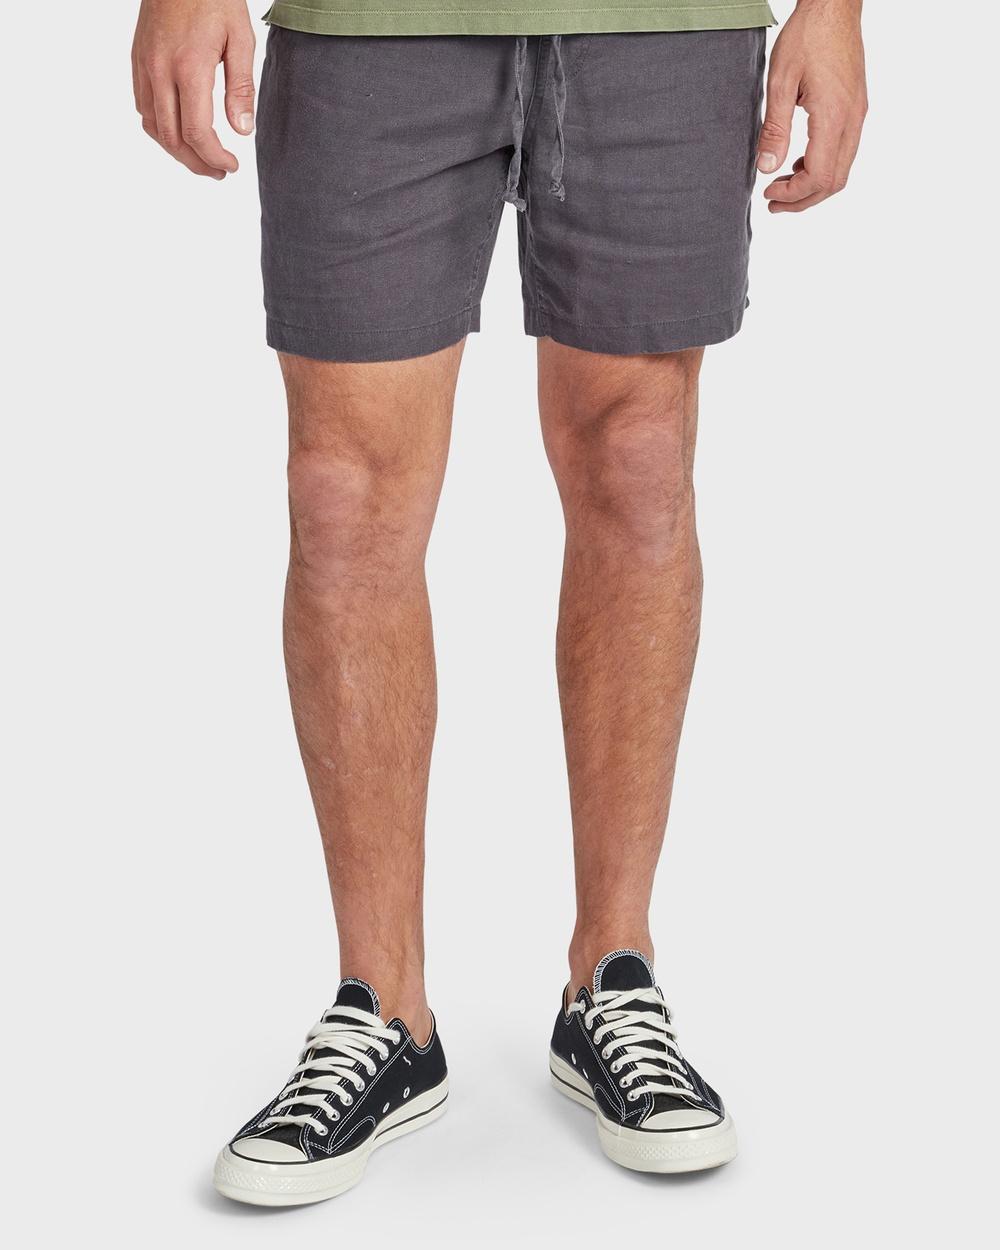 Academy Brand Riviera Linen Short Shorts Grey